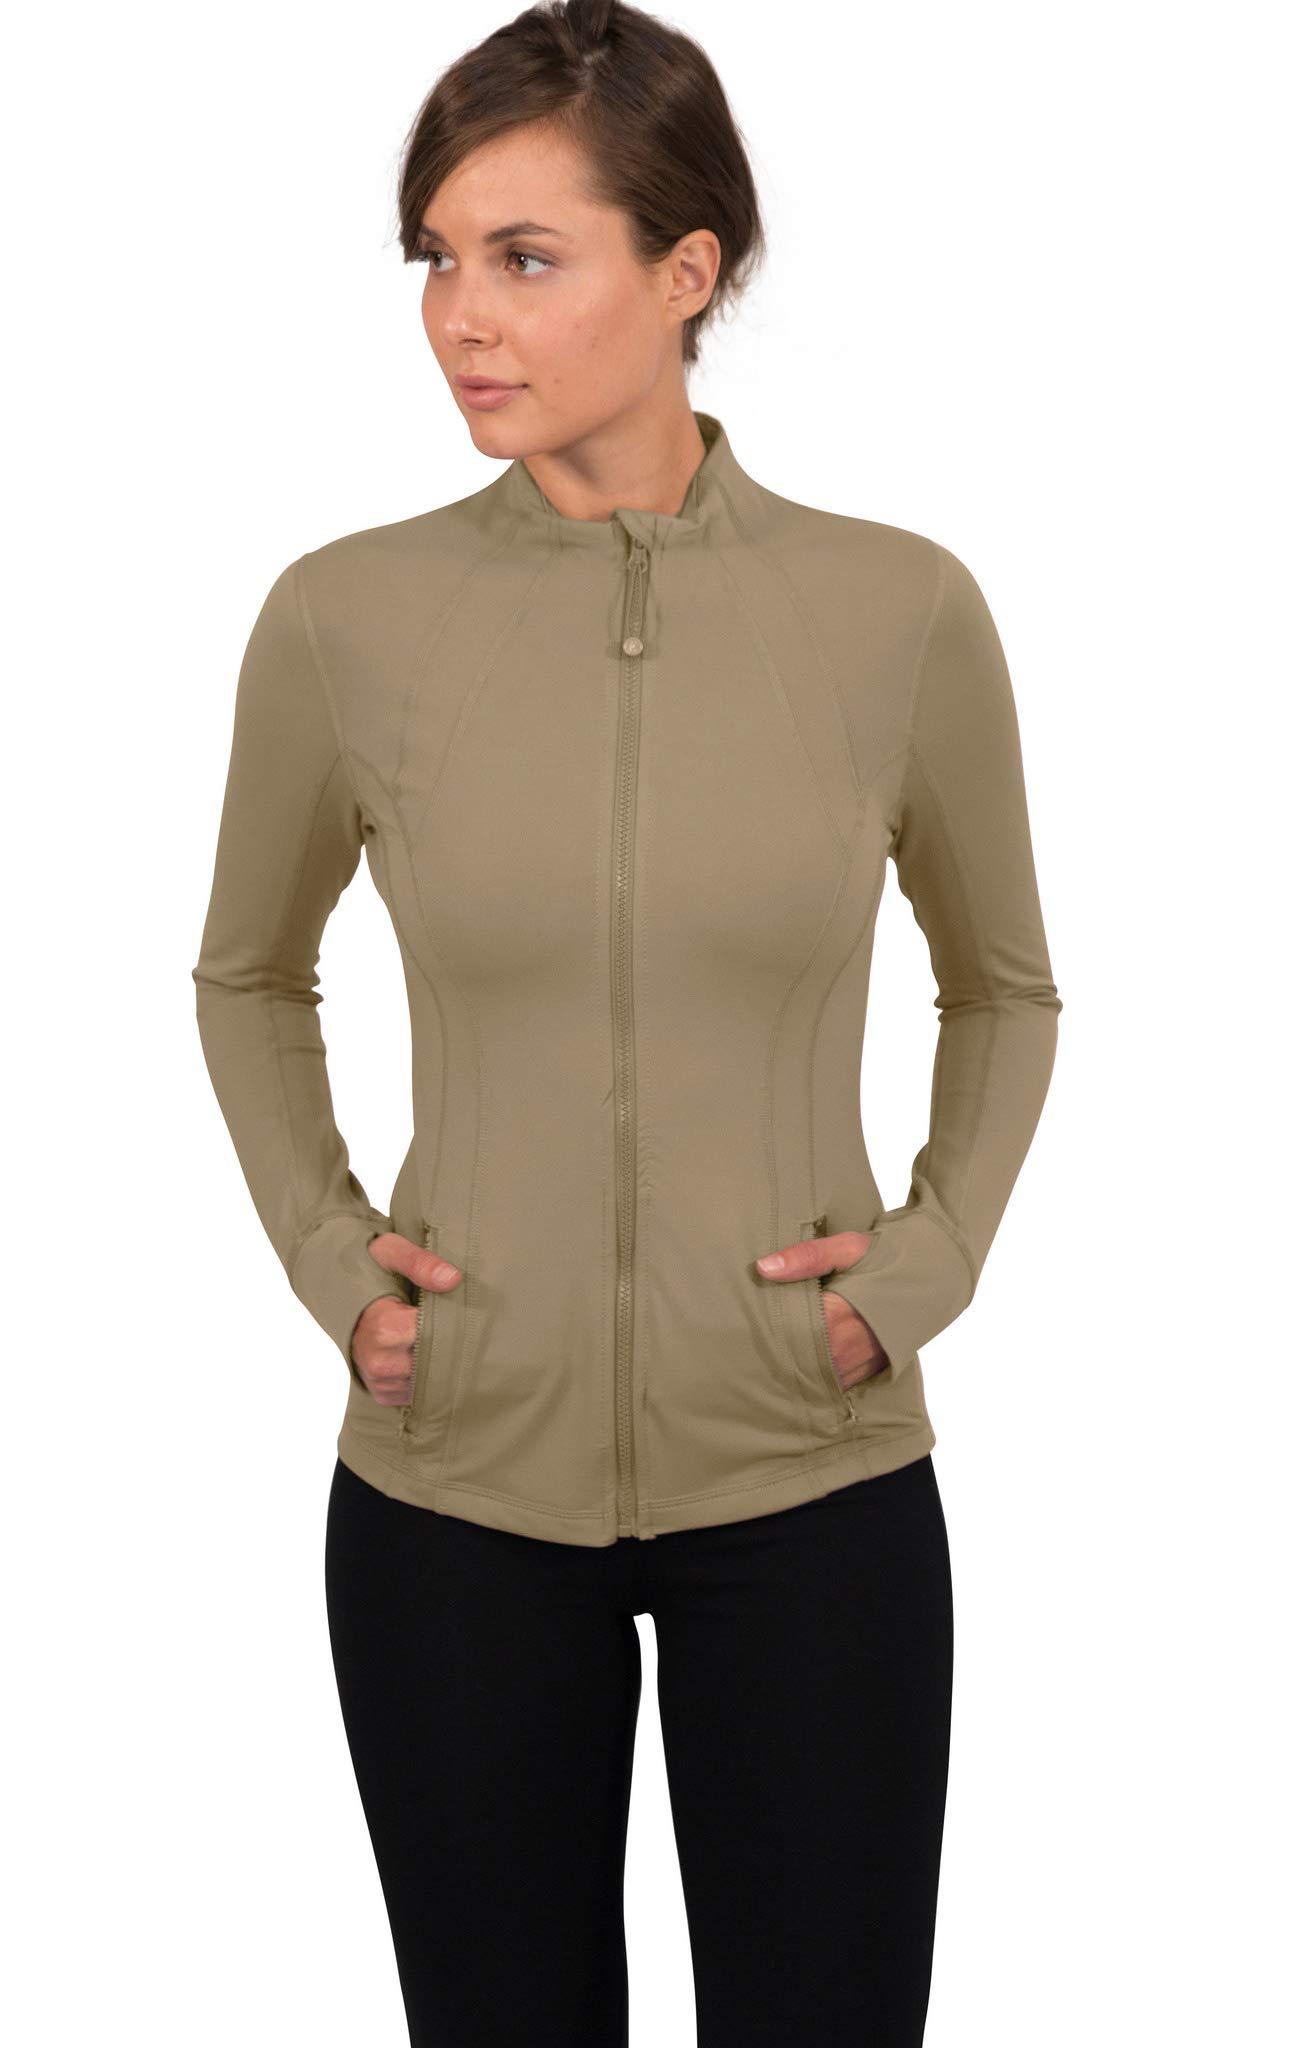 90 Degree By Reflex Women's Lightweight, Full Zip Running Track Jacket - Camel - Small